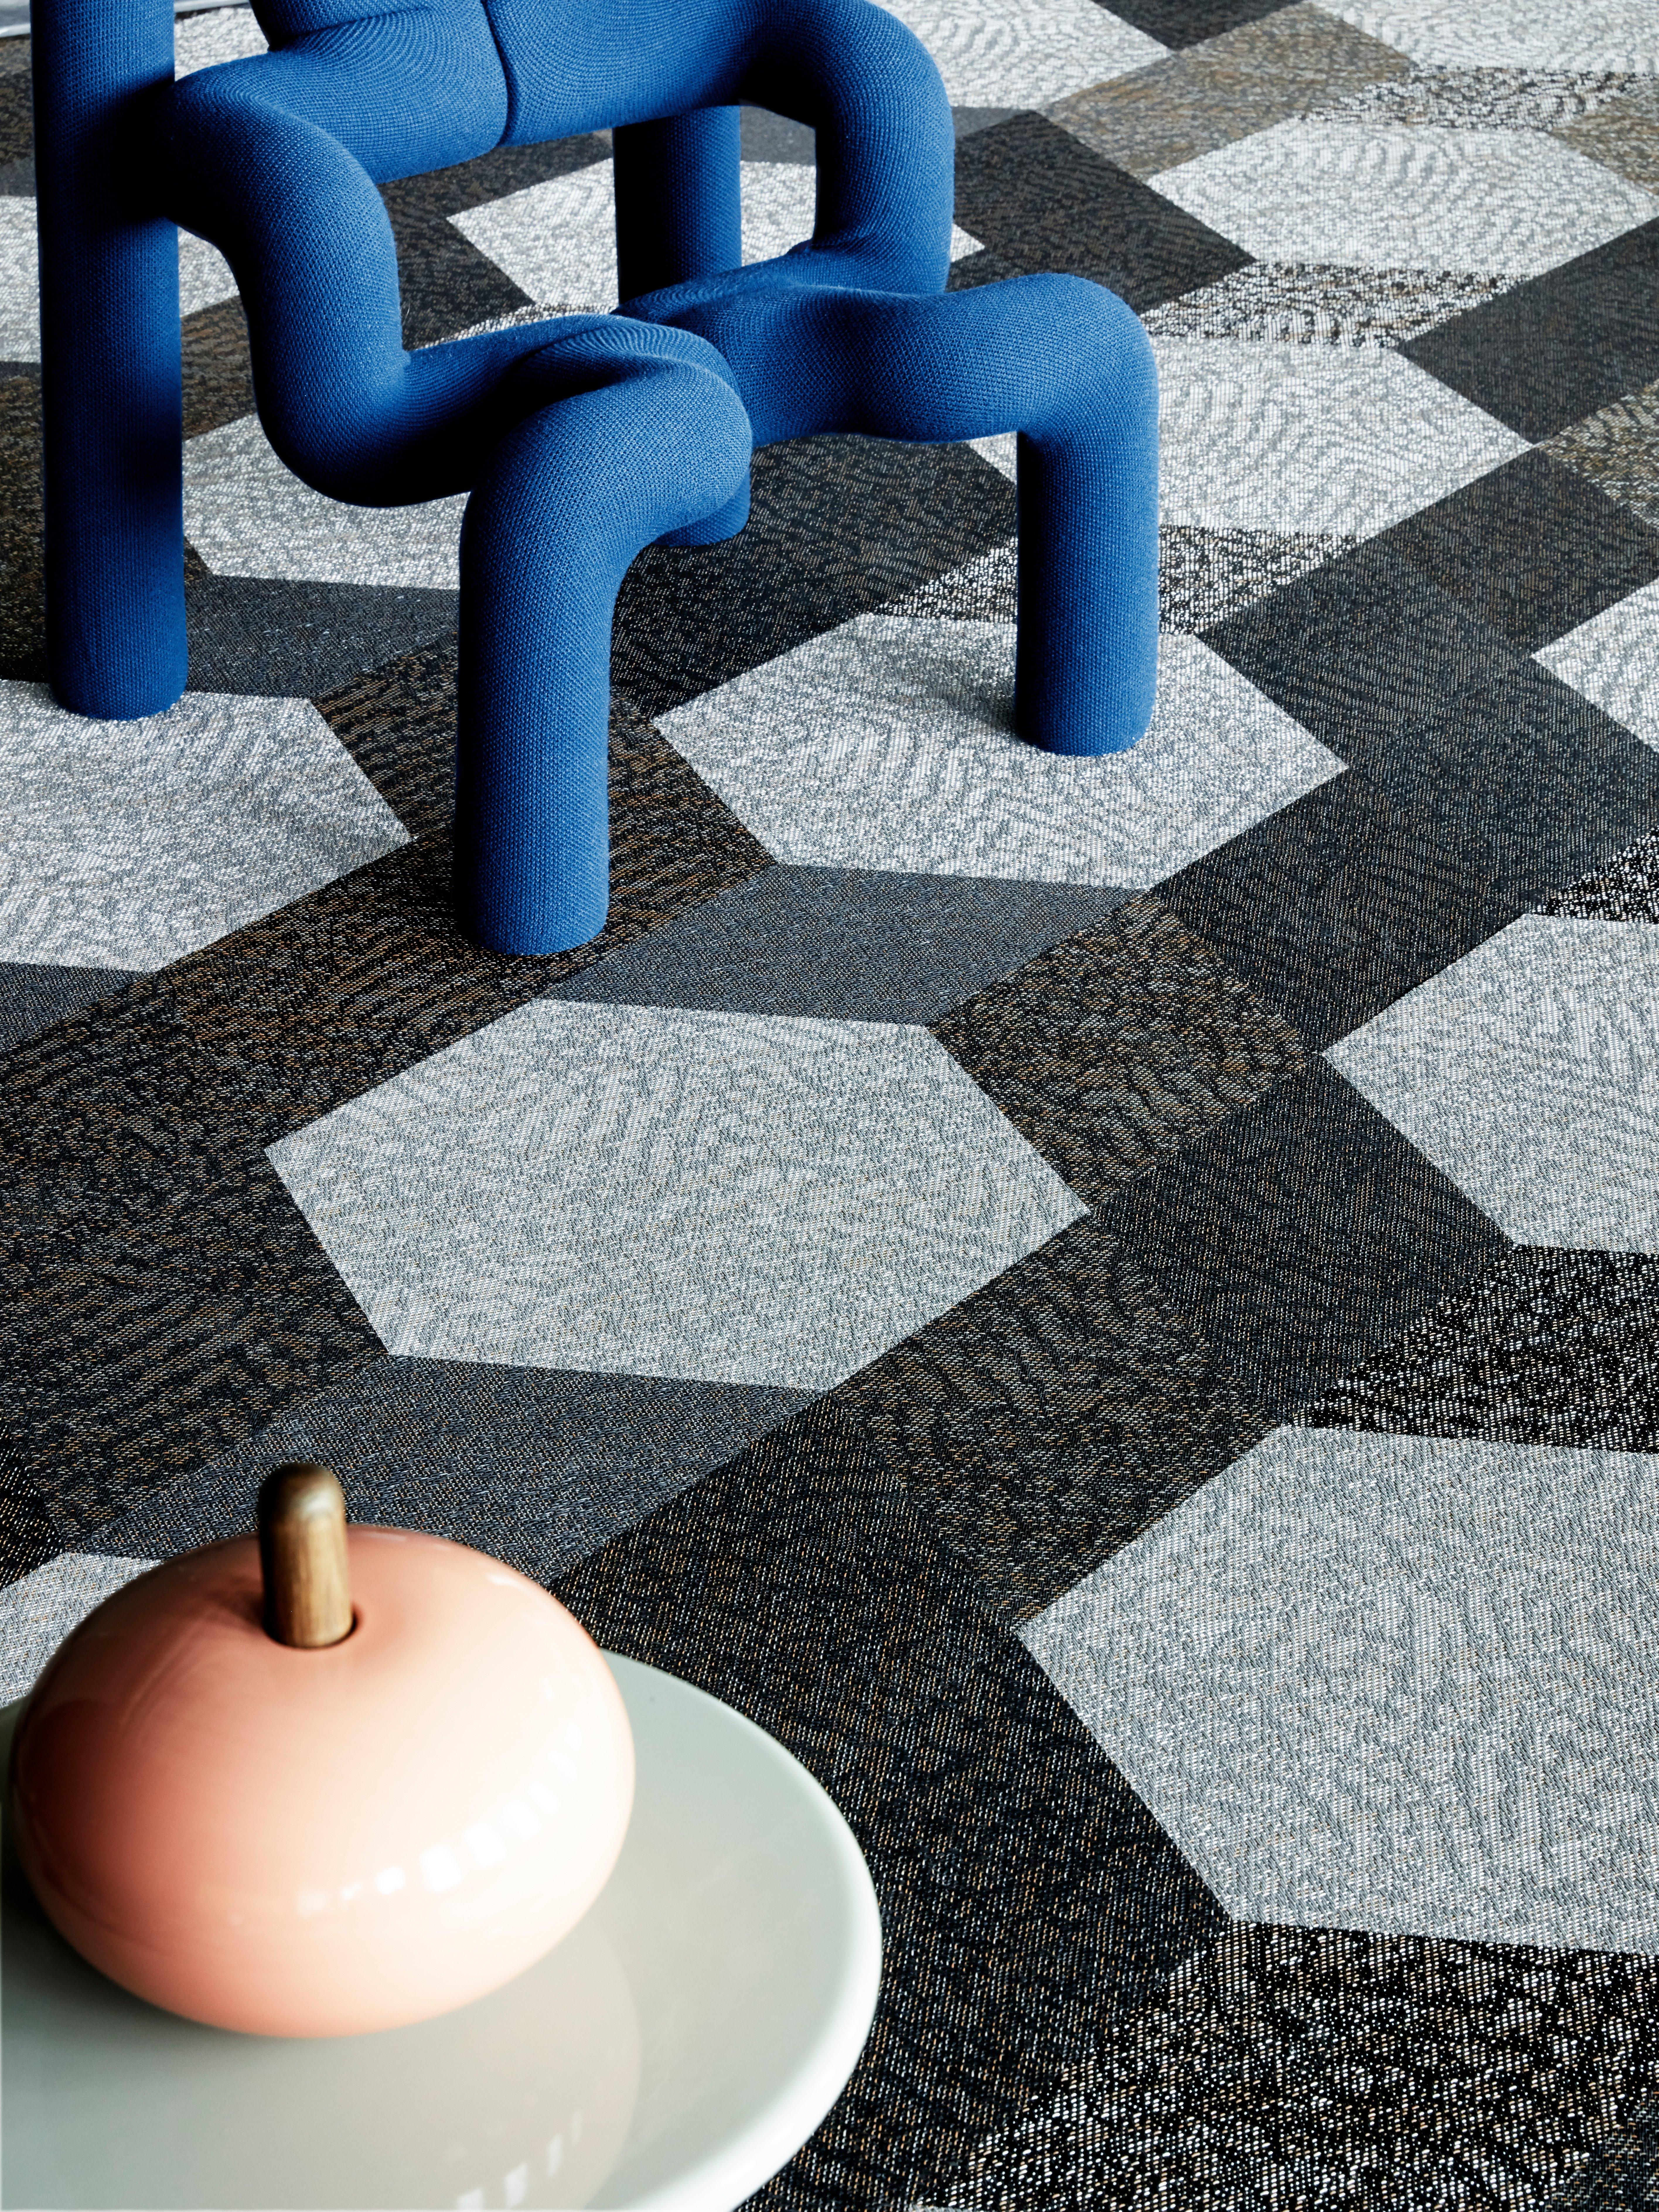 Bolon_Flooring_StudioTilesLink_Diversity_Buzz_Spice_Hexagon_Buzz_ChestnutClose